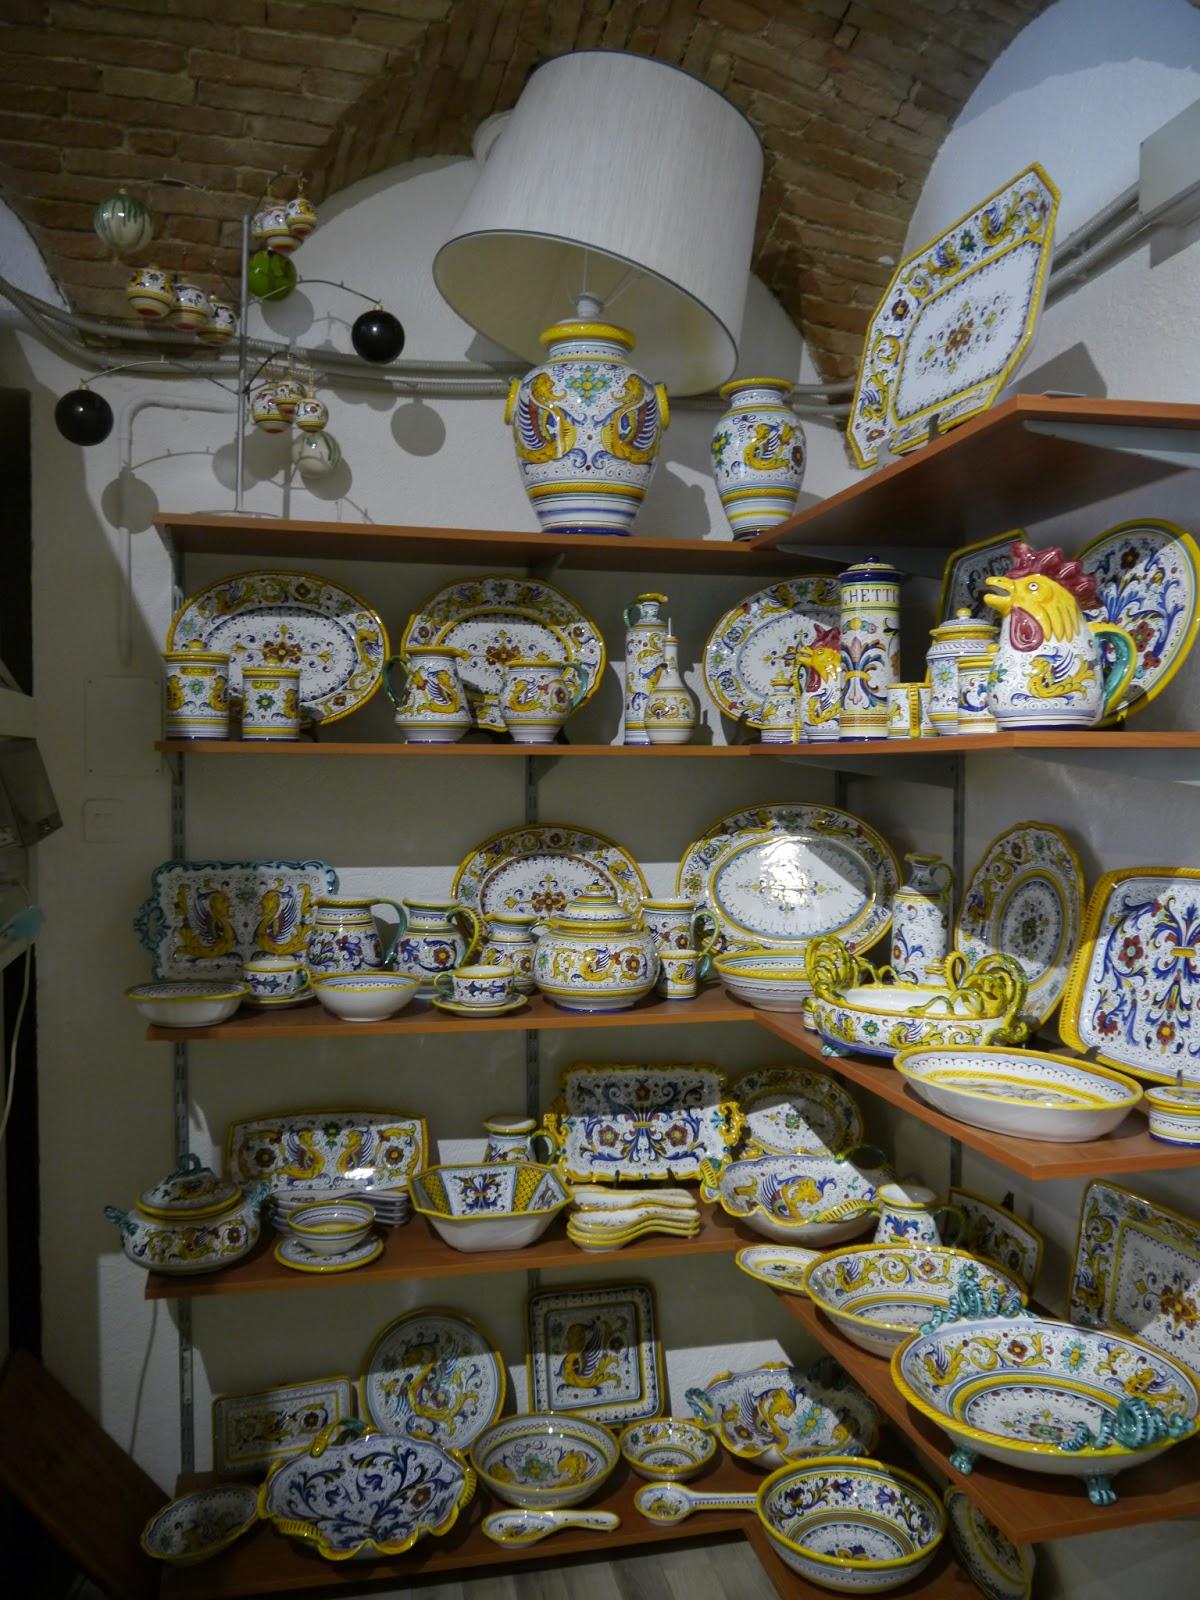 Typical Deruta Style & Cucina Divina: Majolica